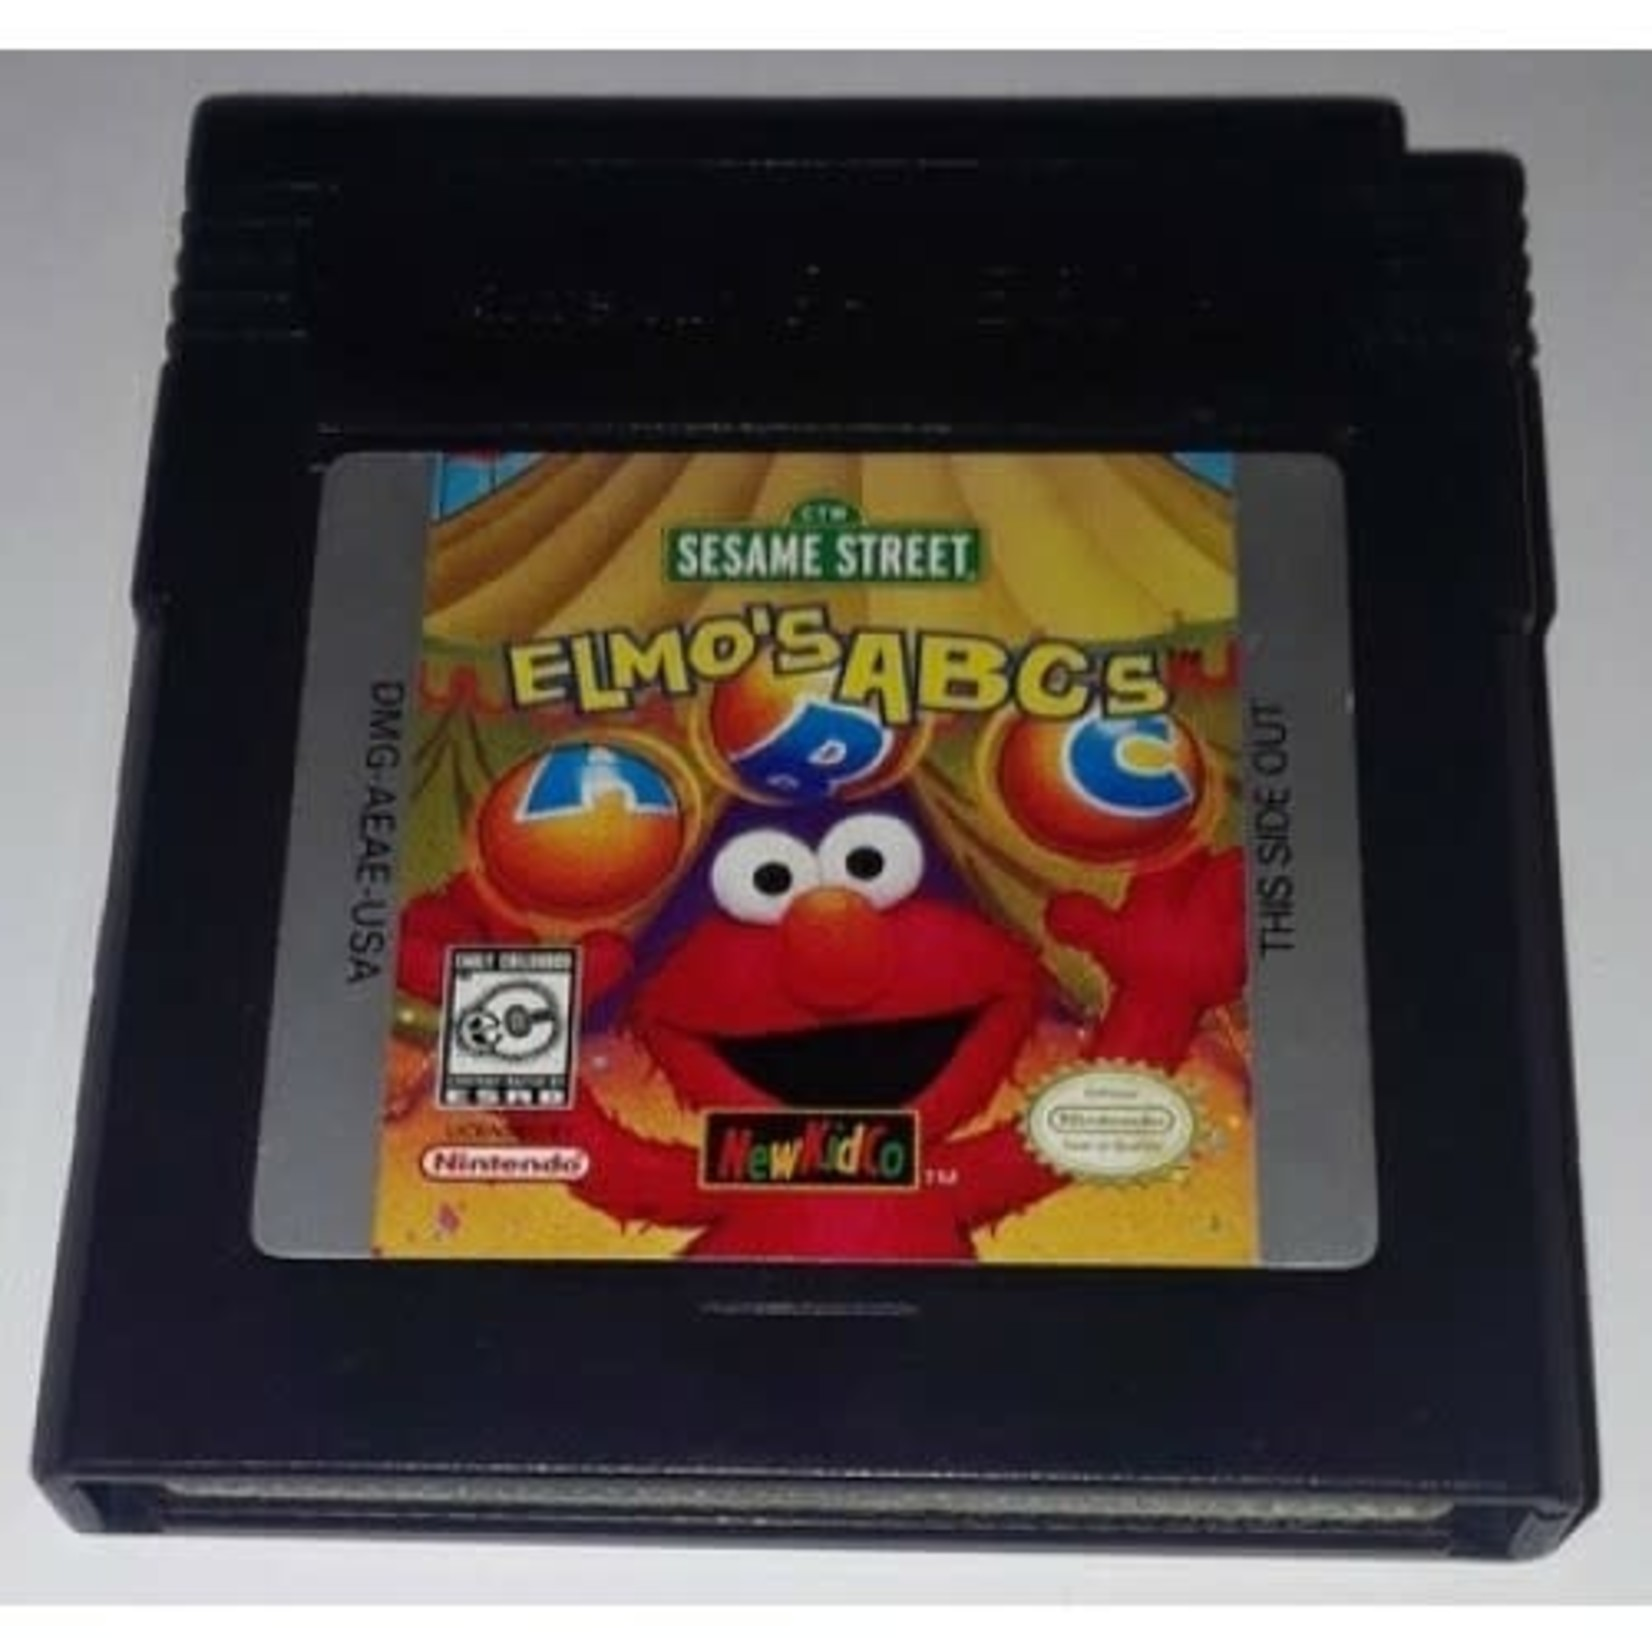 GBCU-Sesame Street Elmo's ABCs (CARTRIDGE)